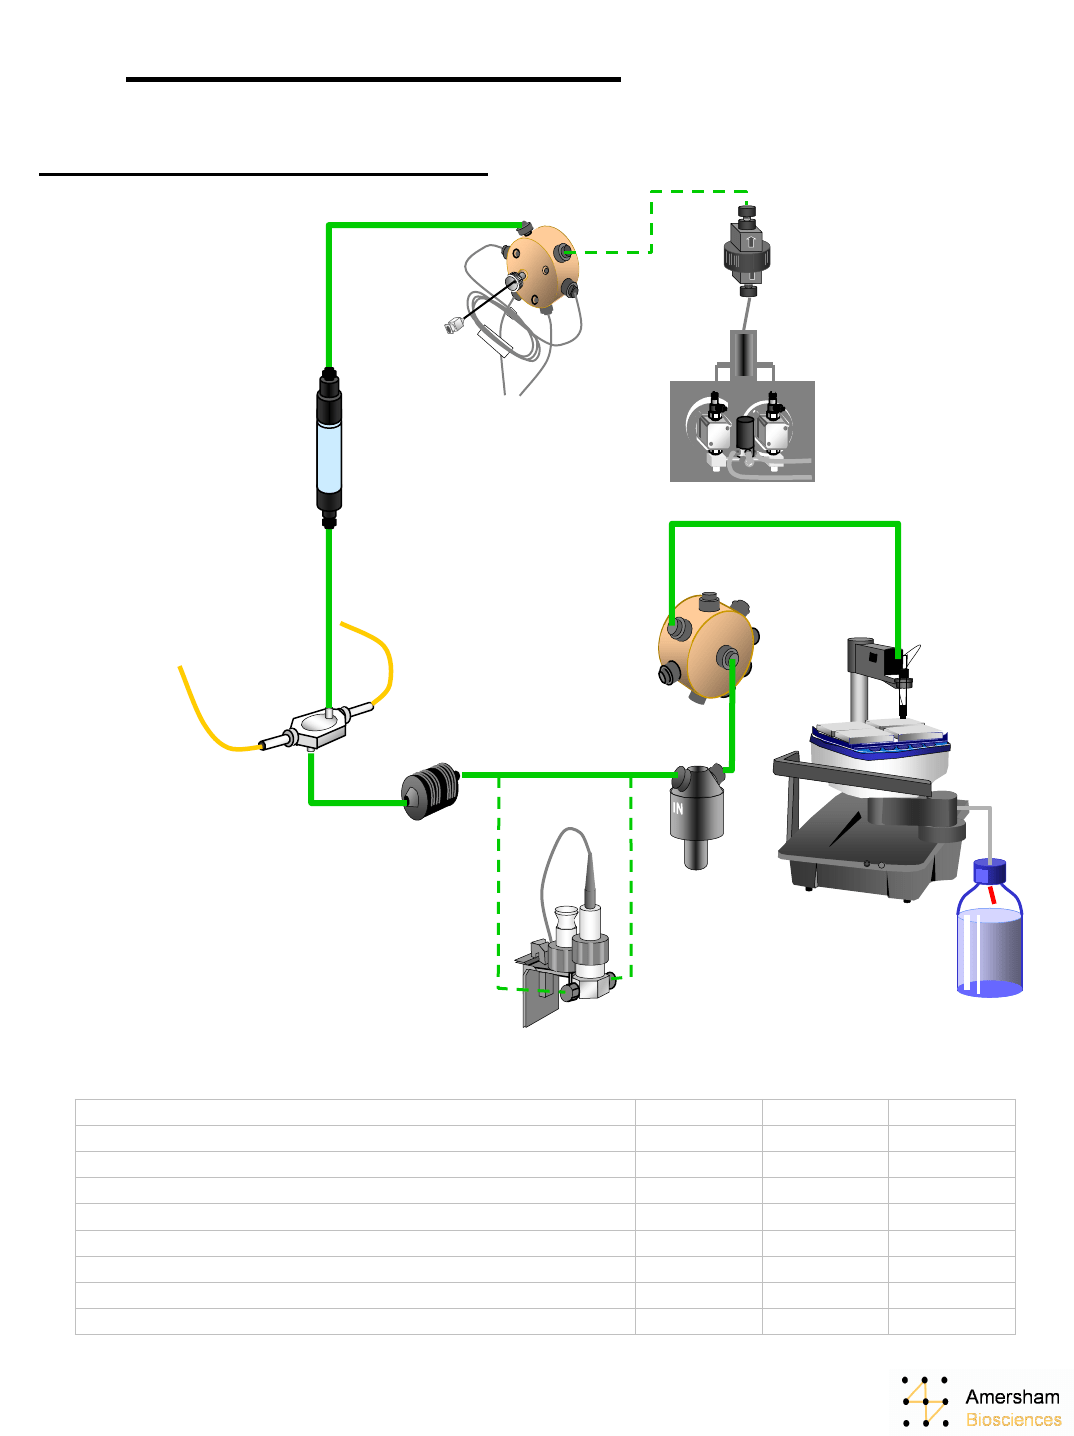 No 900 Mixer AKTA PURIFIER Manual